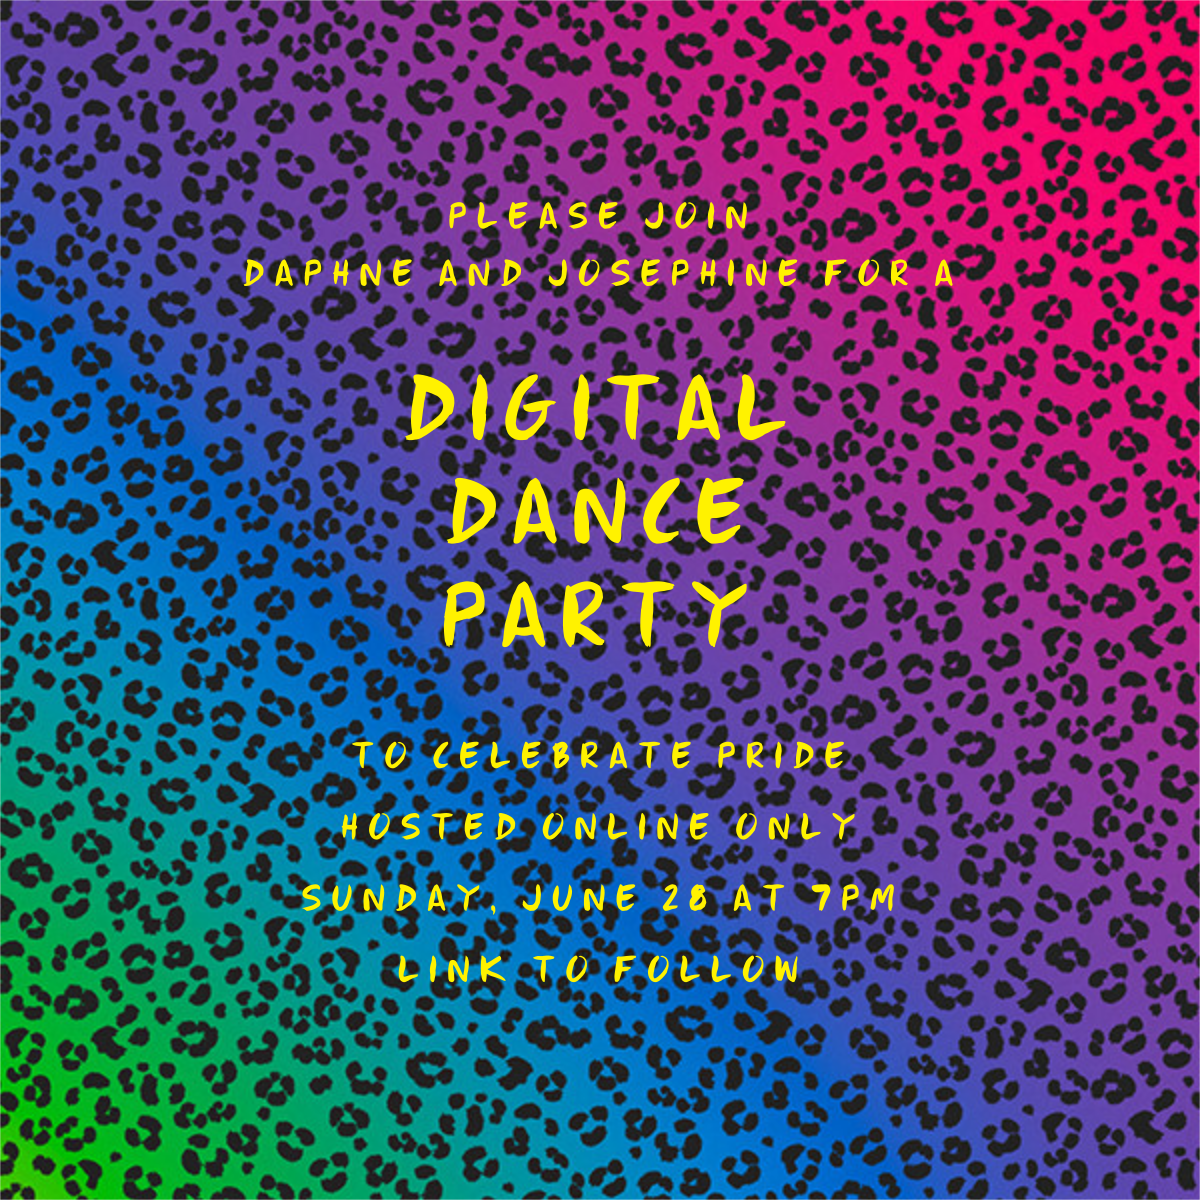 Neon Cheetah - Paperless Post - Virtual parties